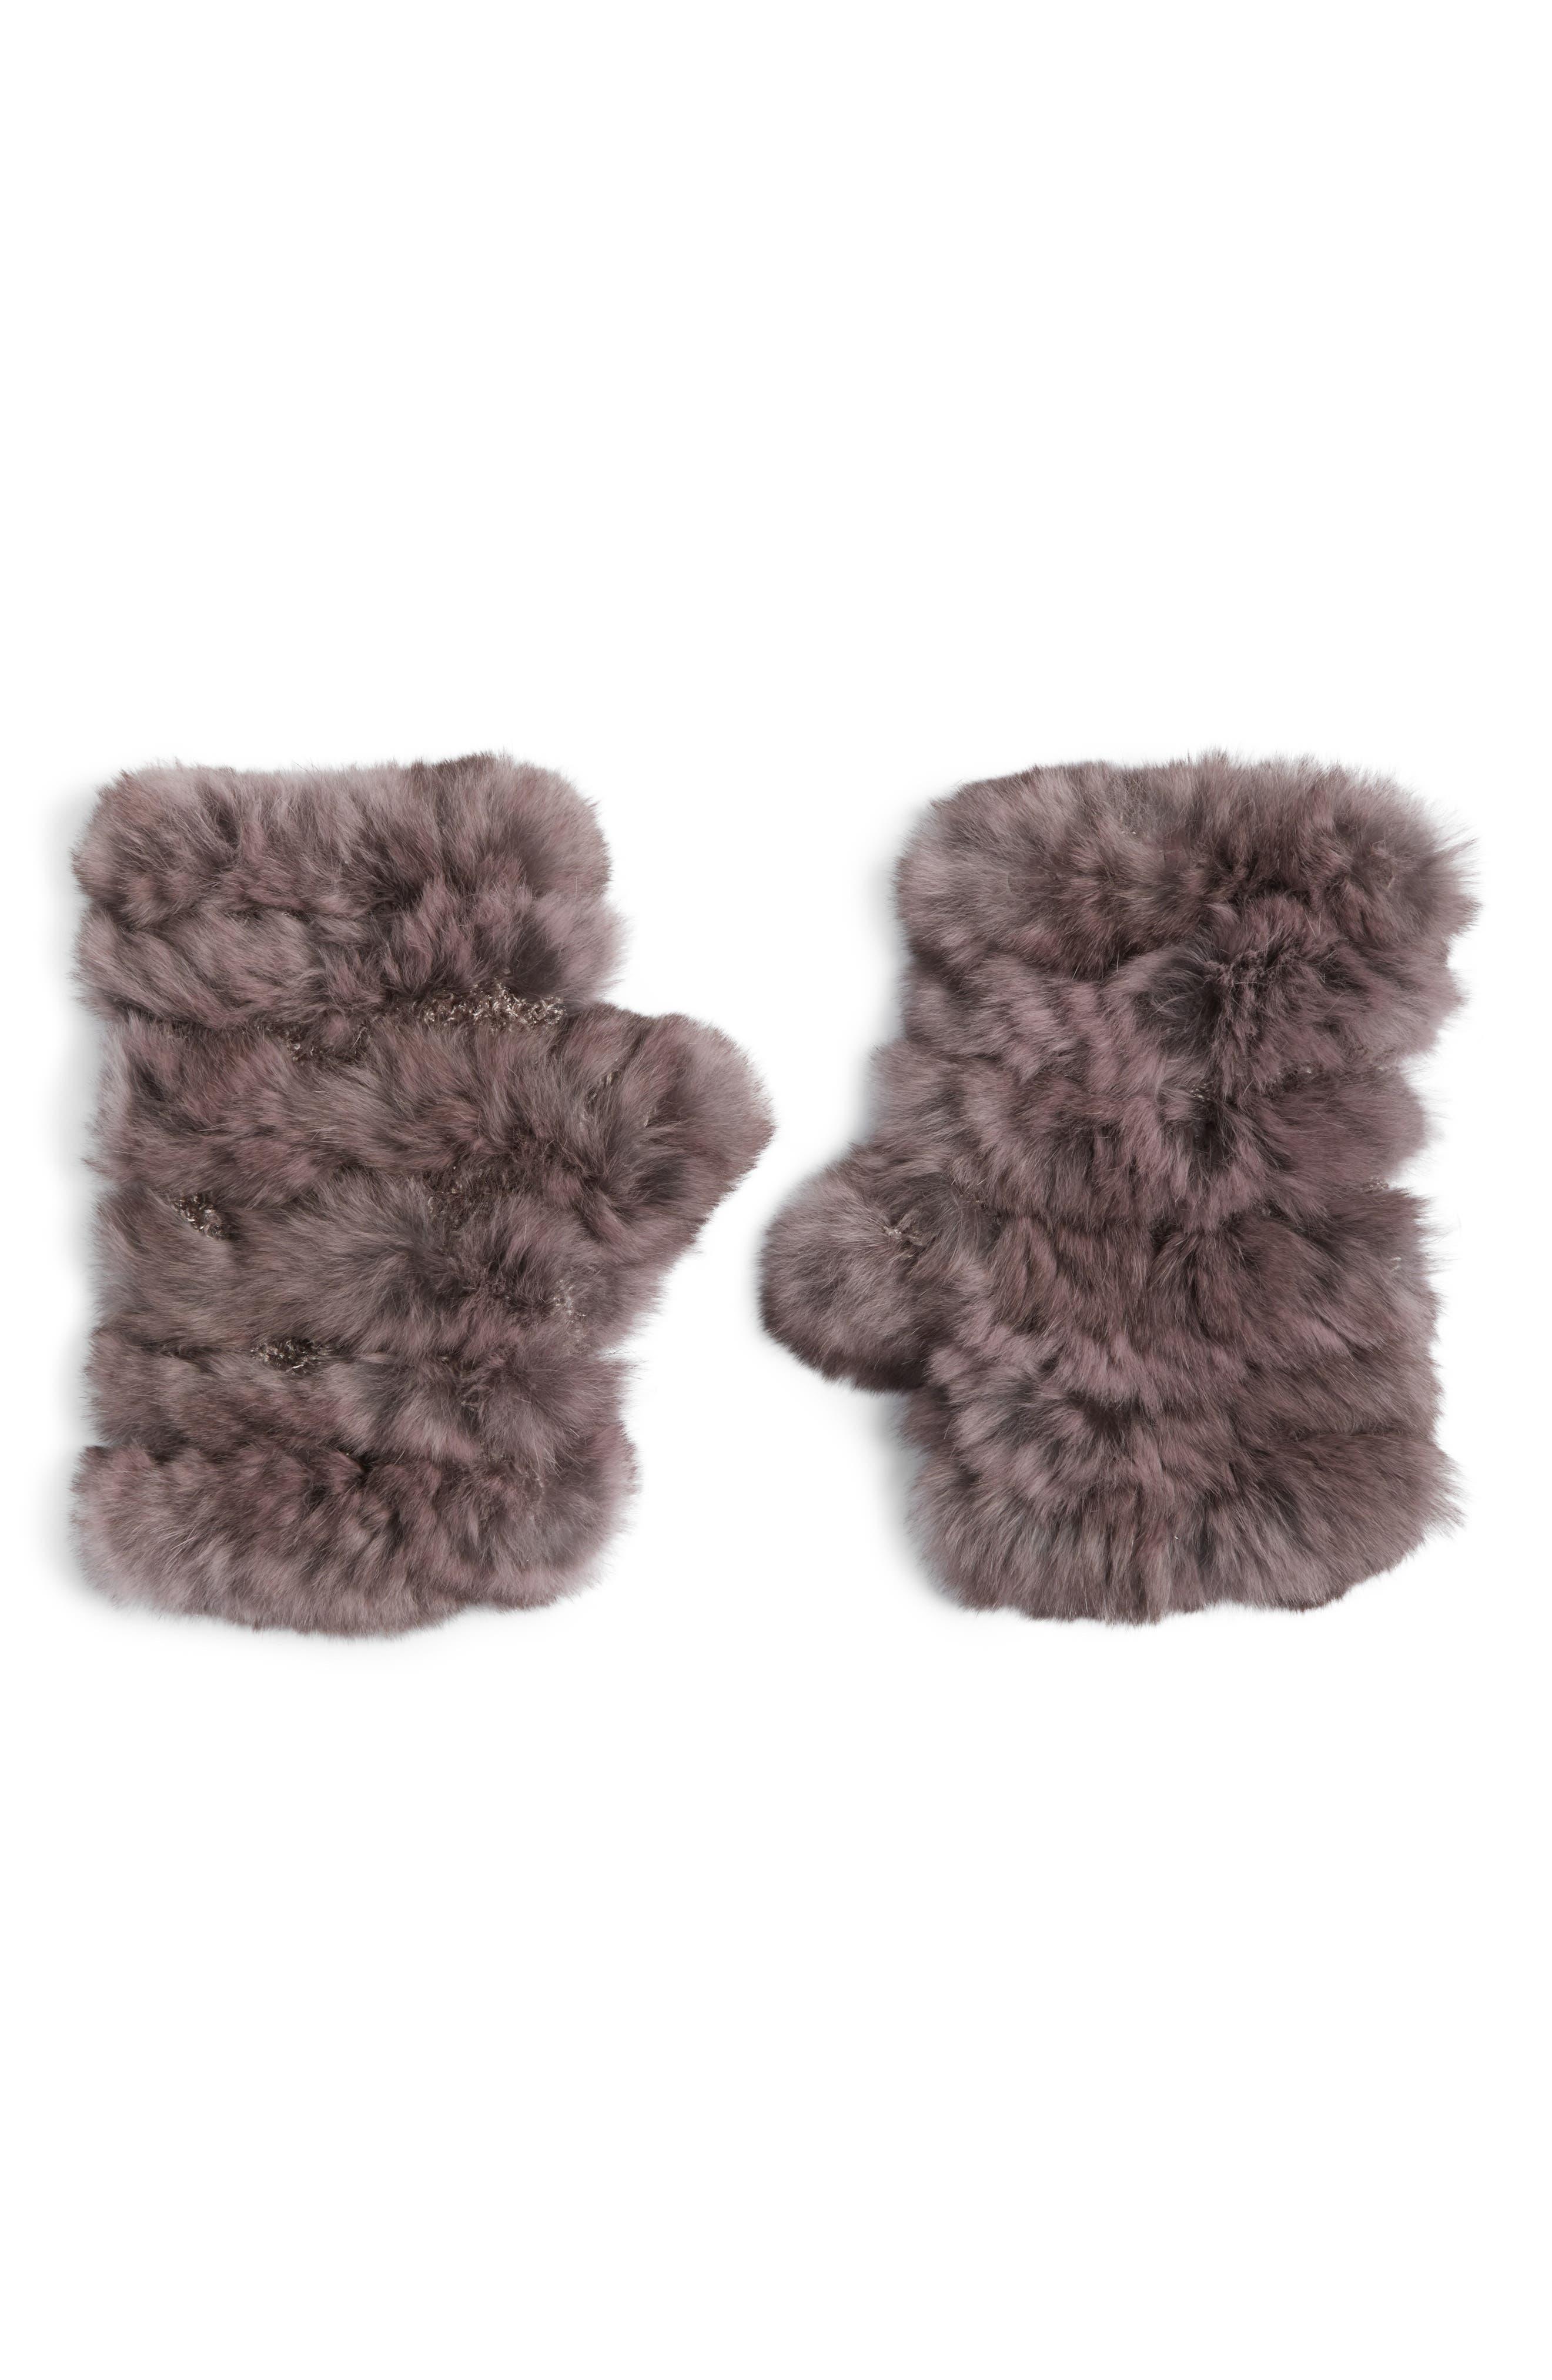 Genuine Rabbit Fur Fingerless Knit Mittens,                             Main thumbnail 1, color,                             Dusty Lavender